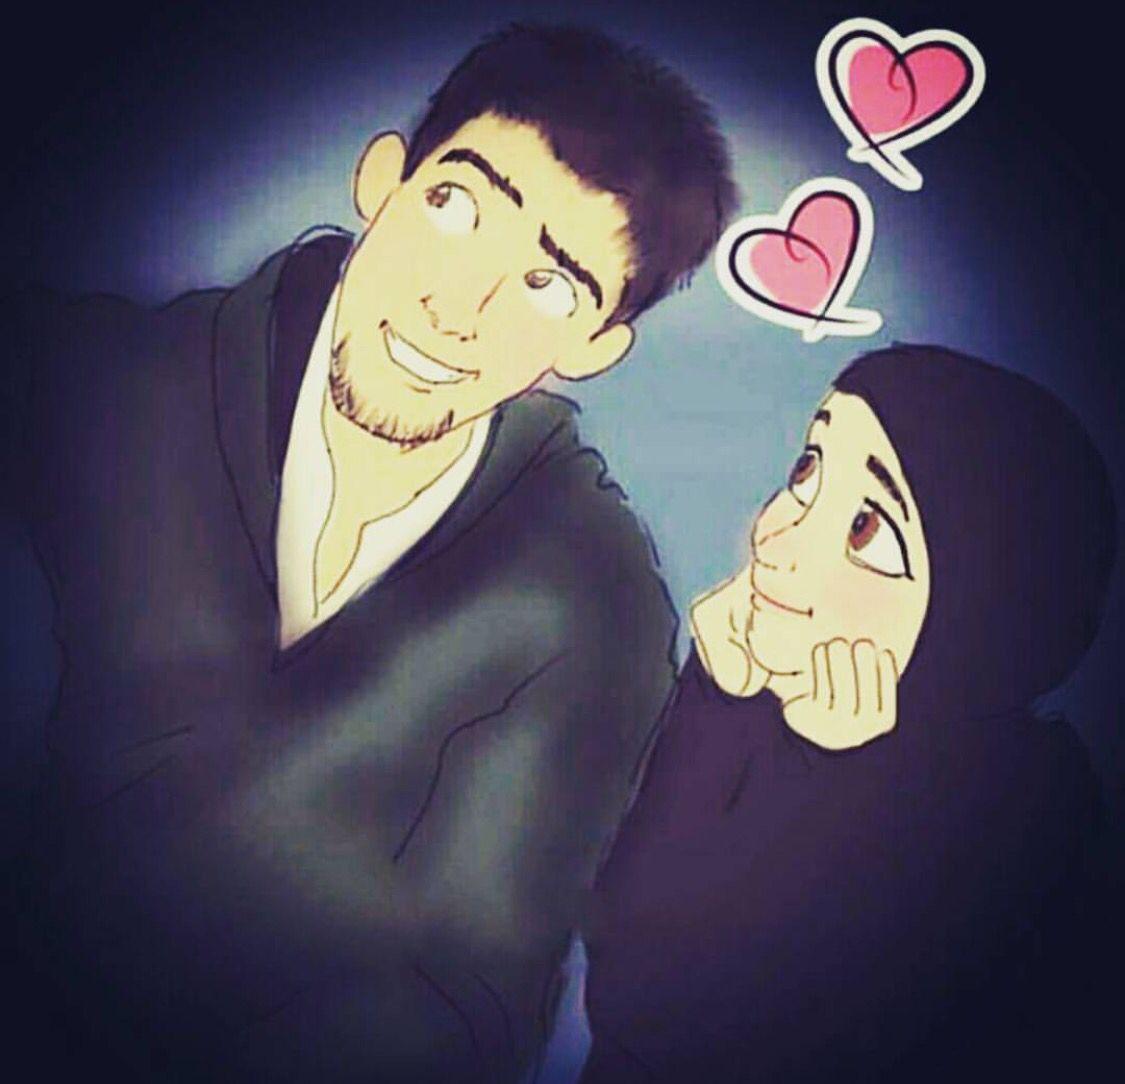 Islamic Anime Wallpaper Beautiful Love Muslim Couples